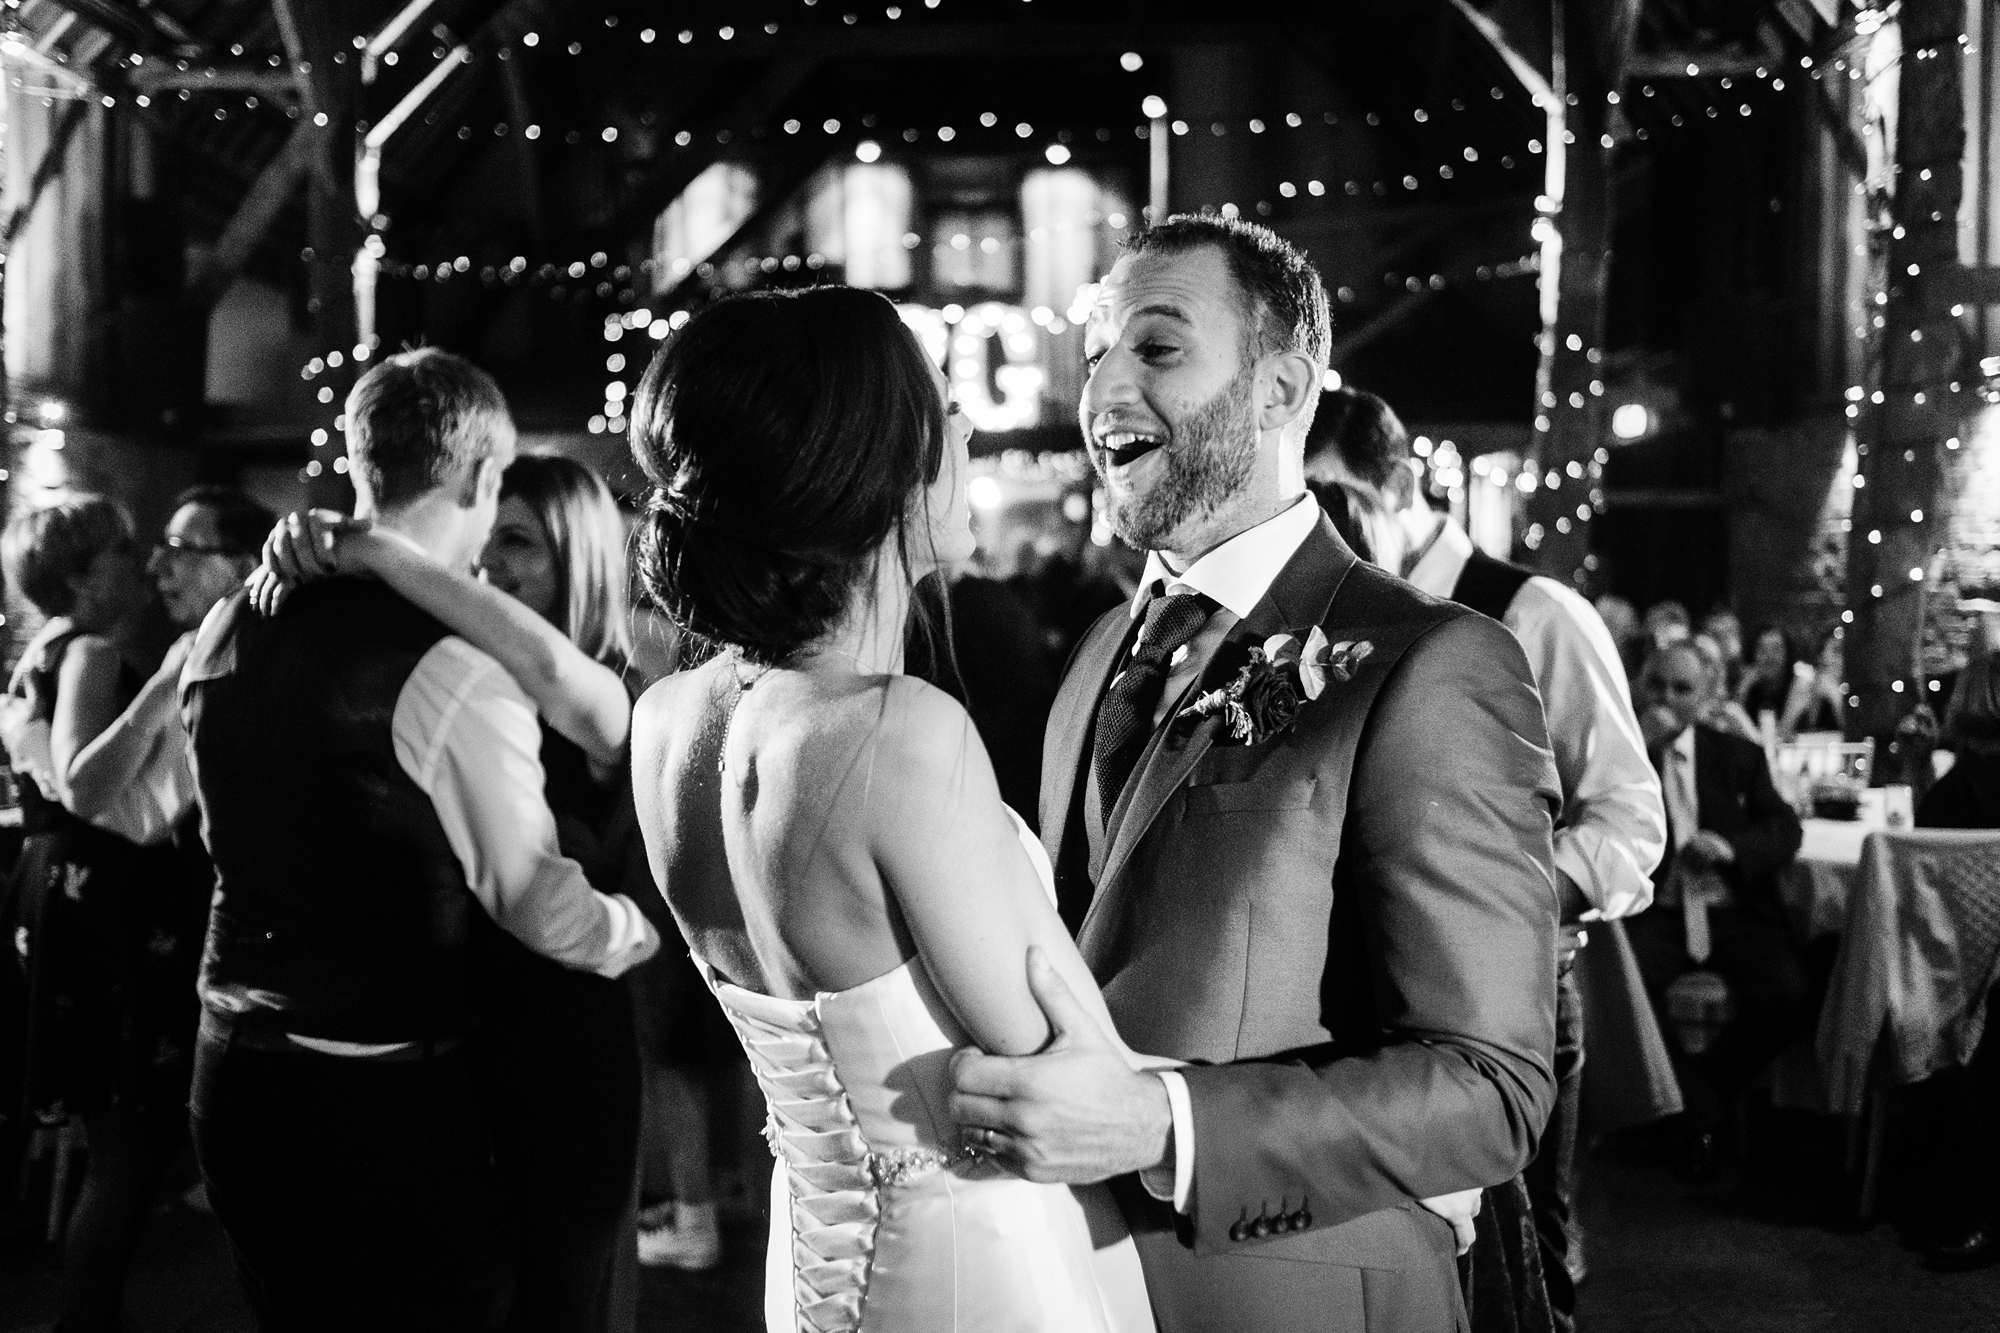 Best wedding photography 2018Best wedding photography 2018